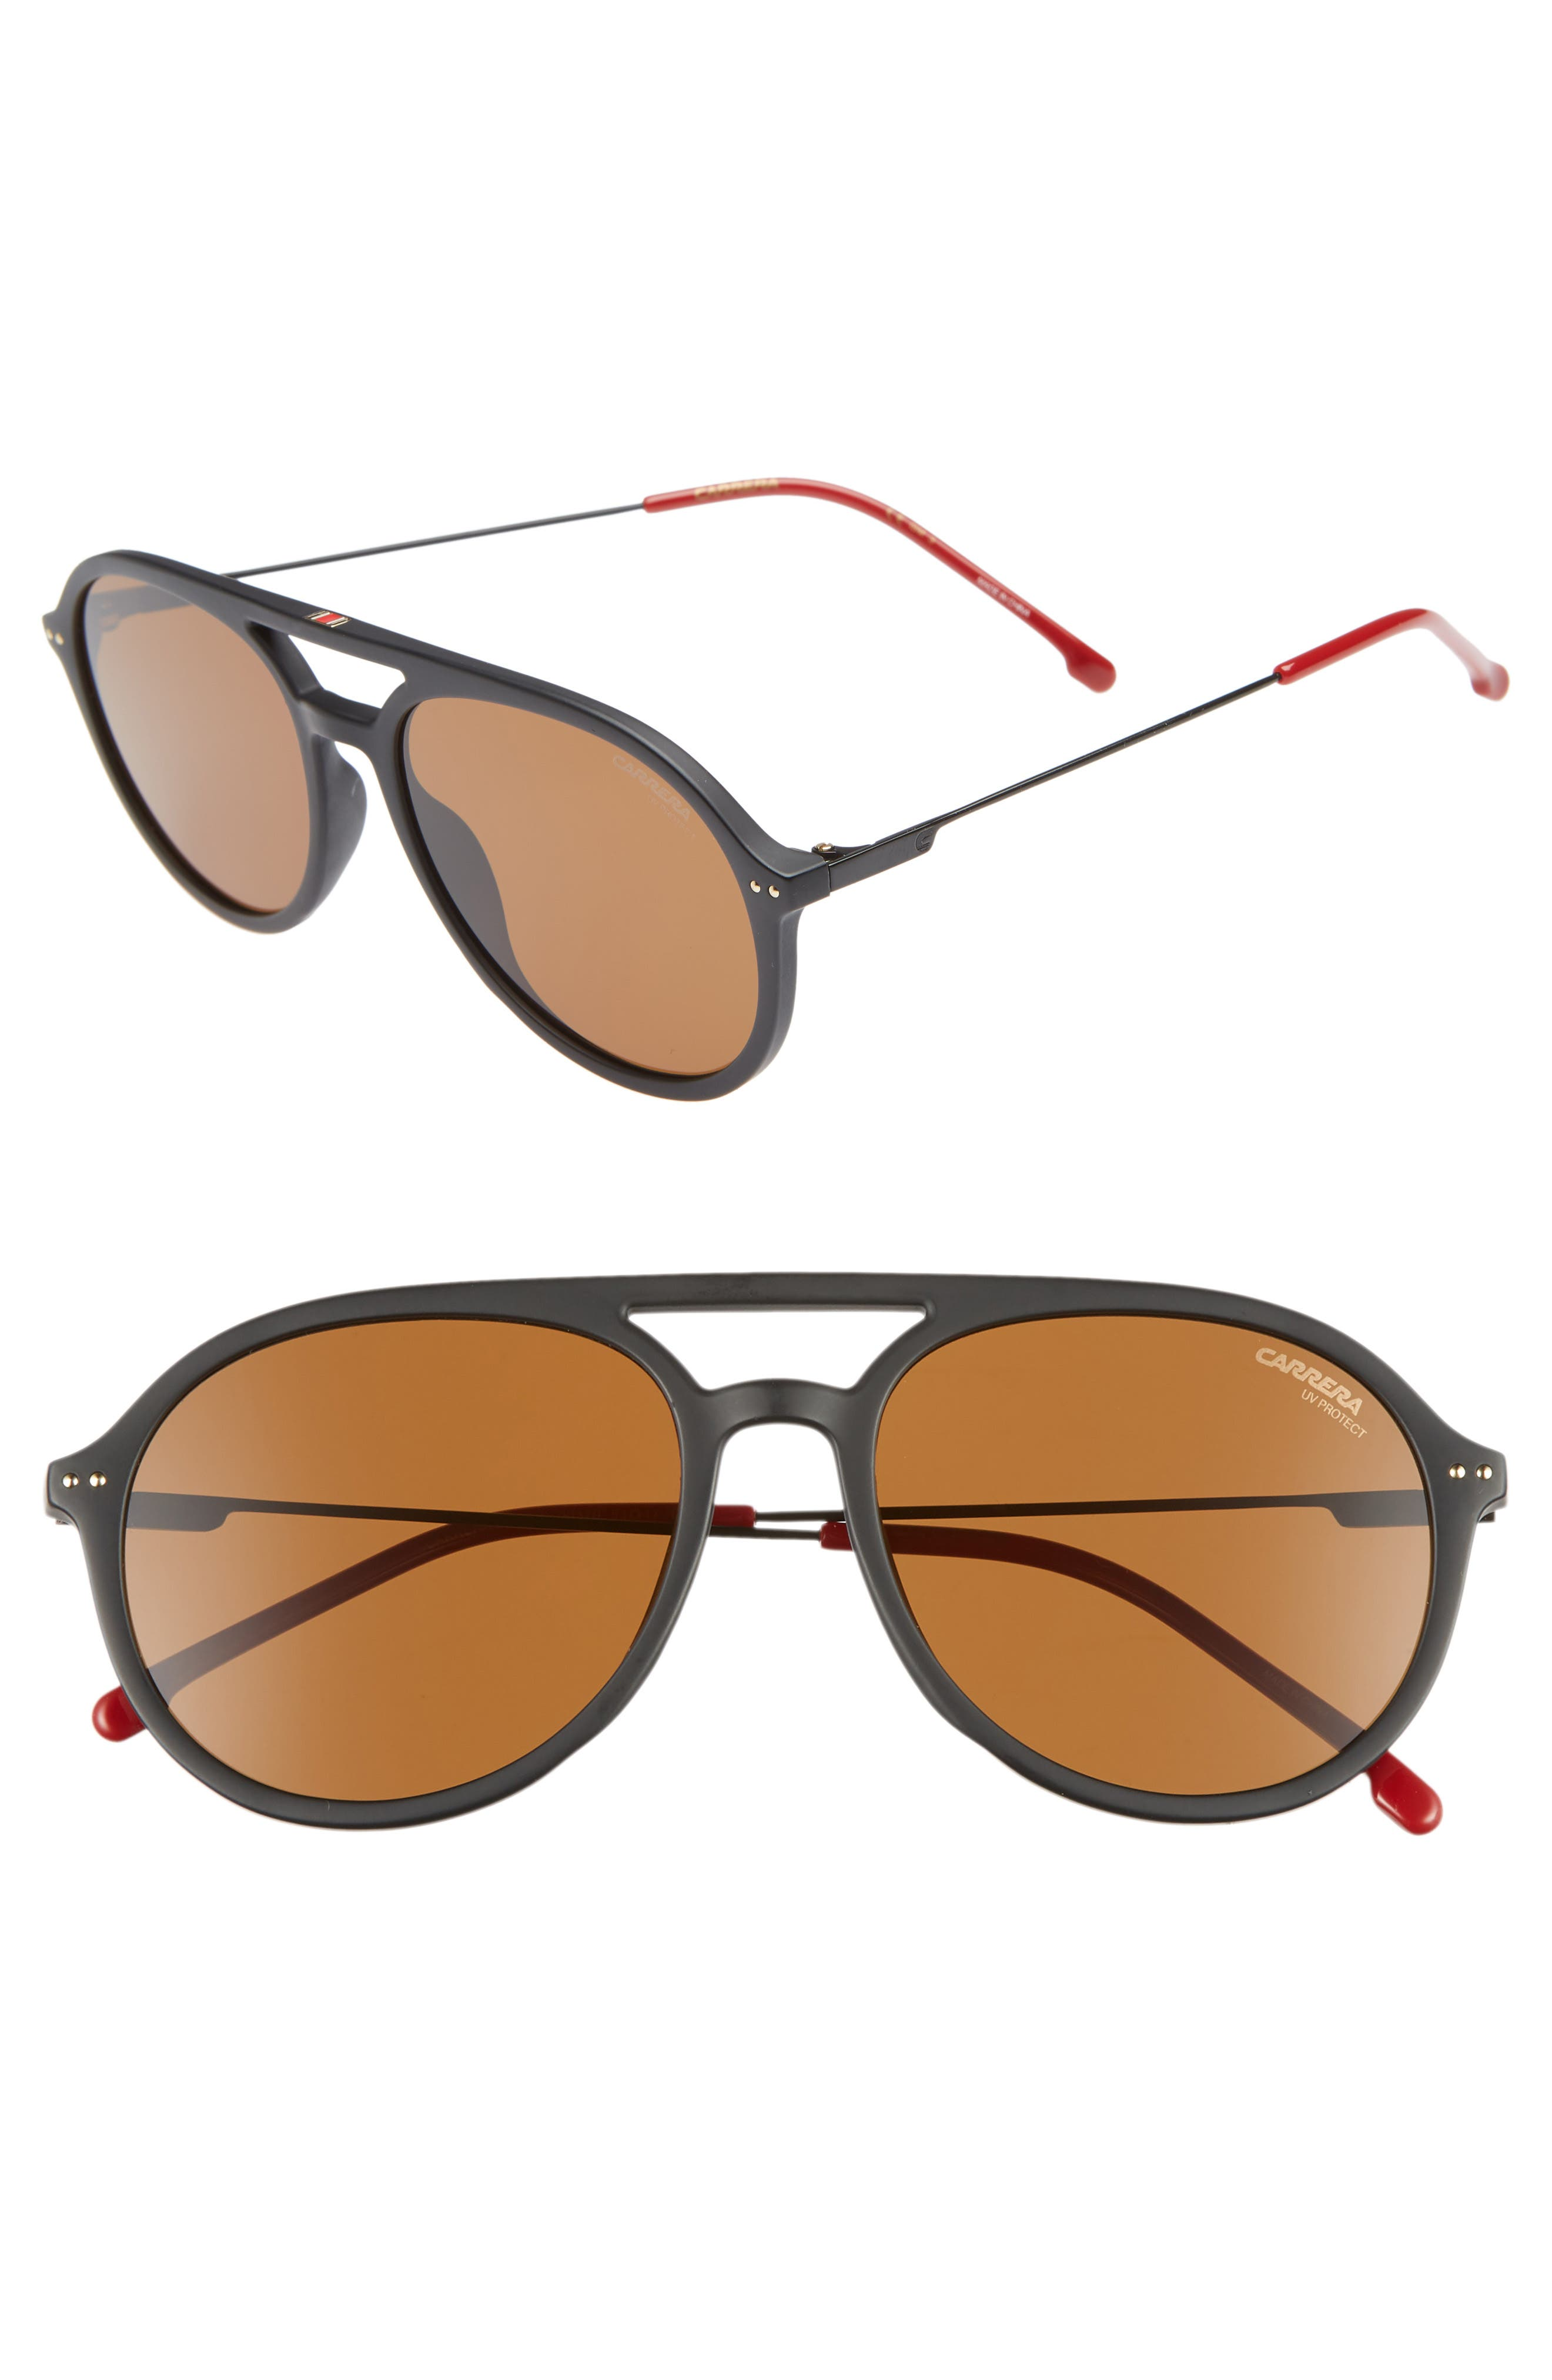 Carrera Eyewear 5m Aviator Sunglasses - Matte Black